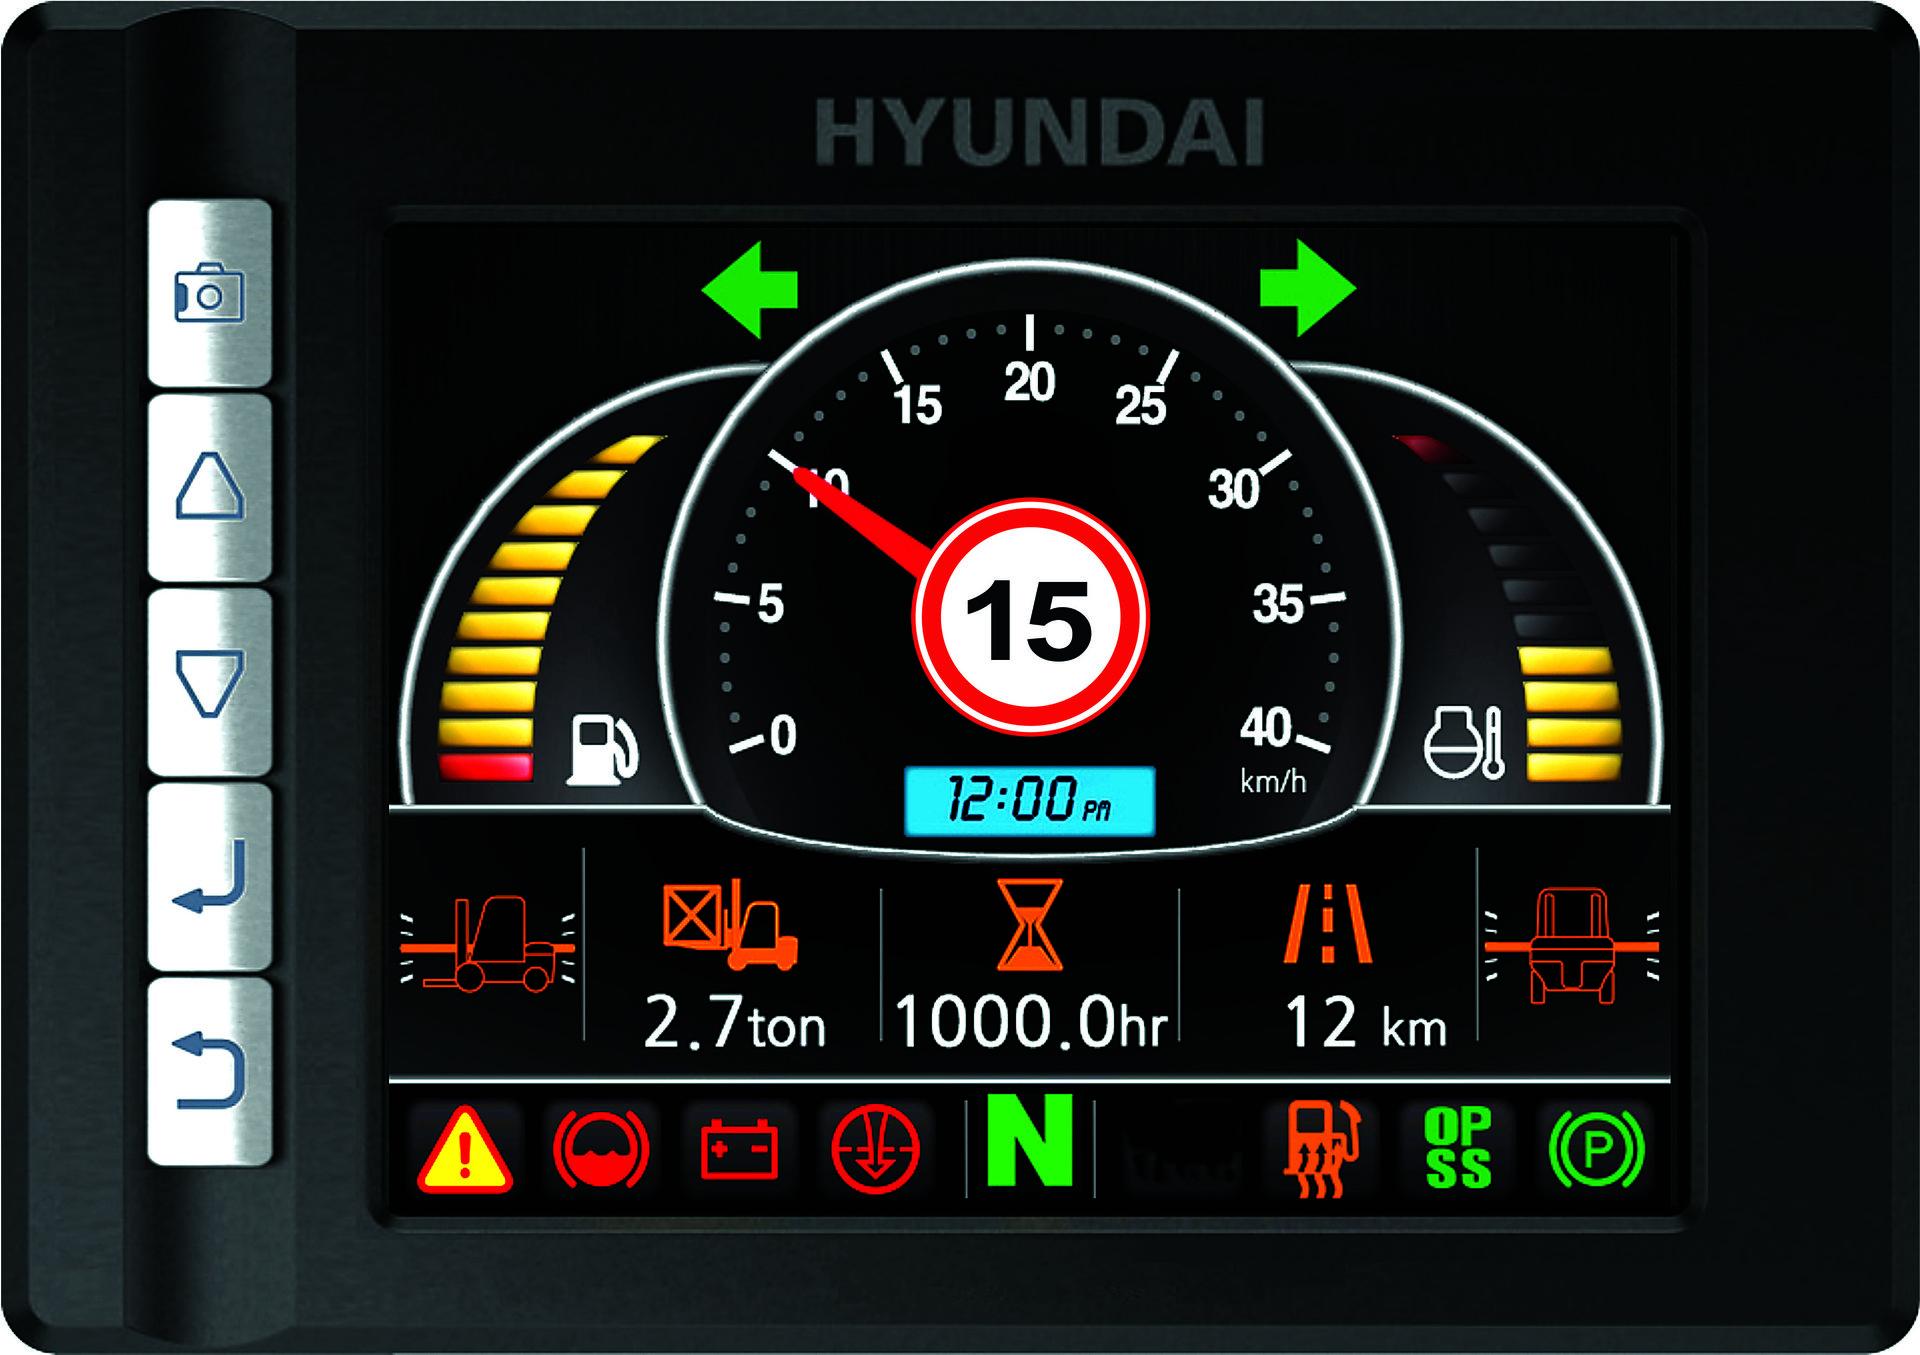 monitor carrelli diesel hyundai, computer di bordo carrelli diesel hyundai